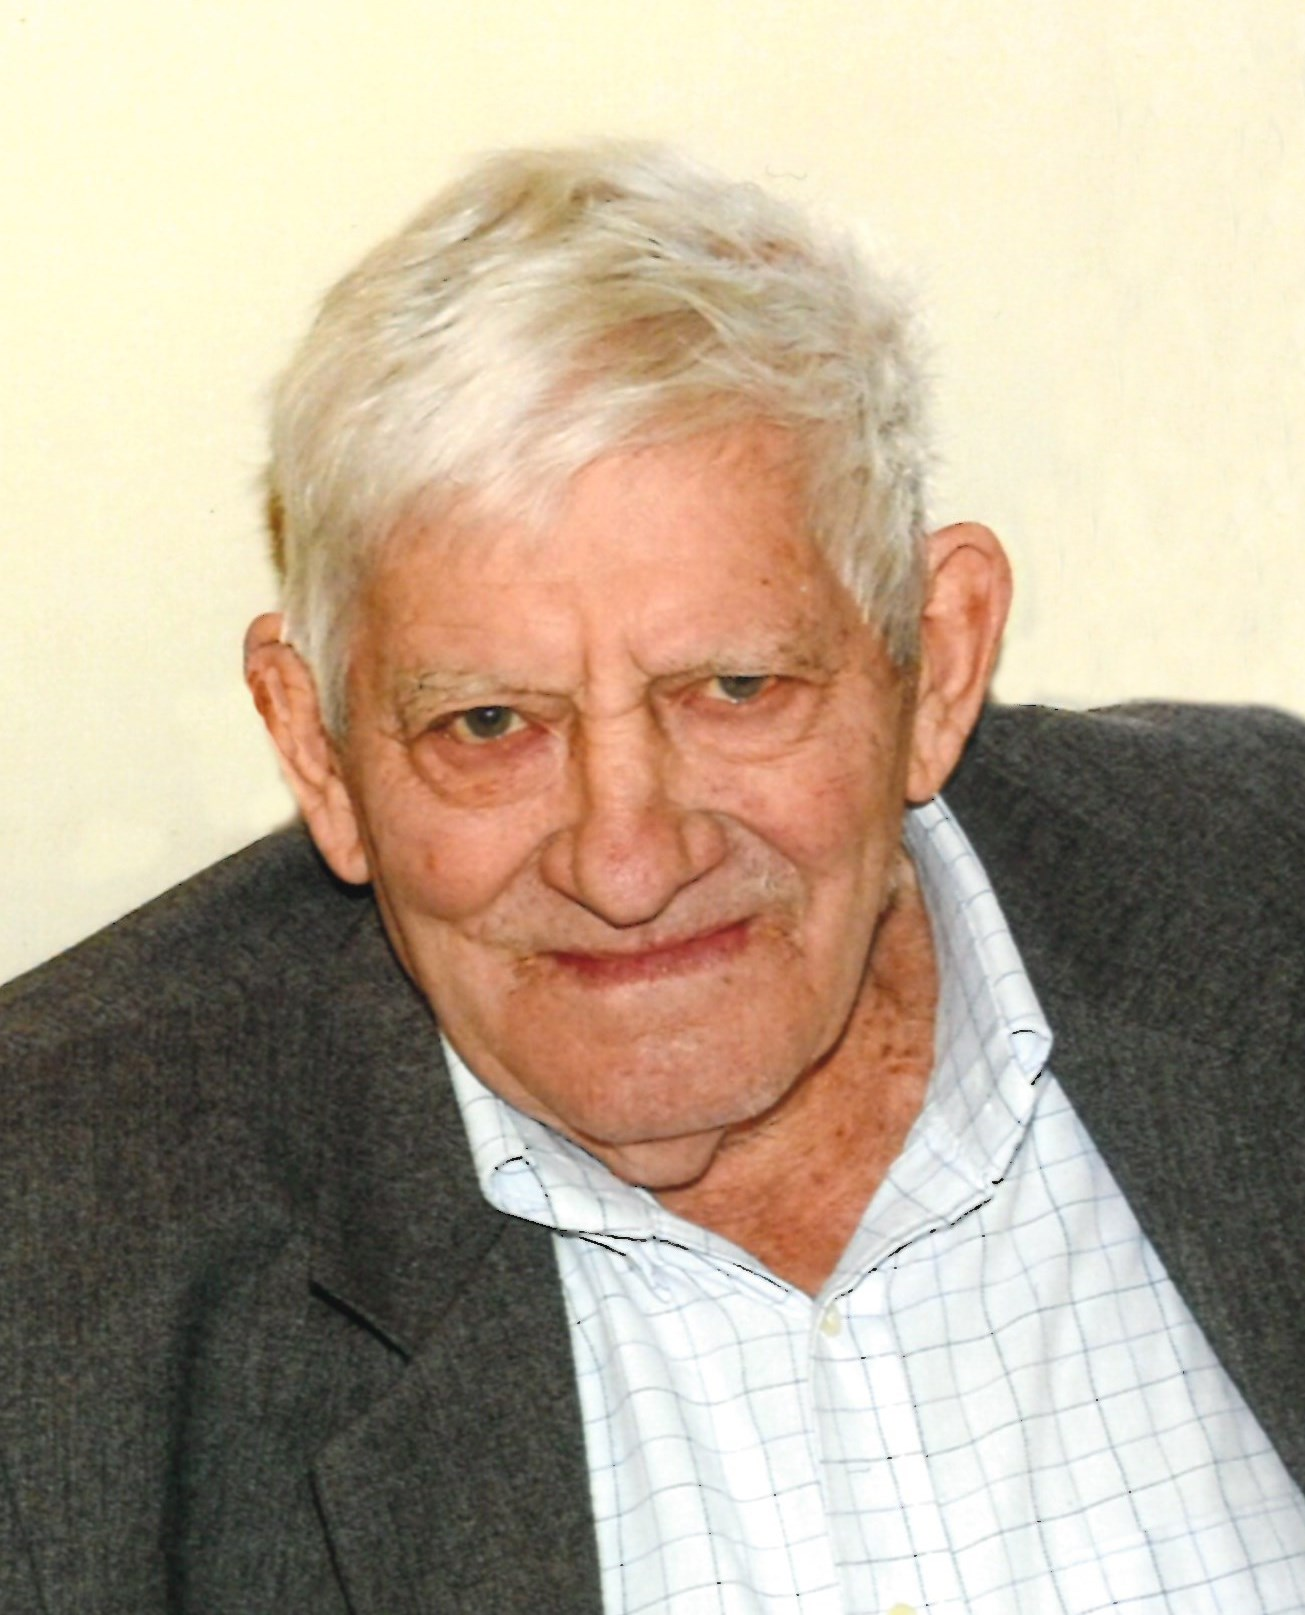 Elio Greatti